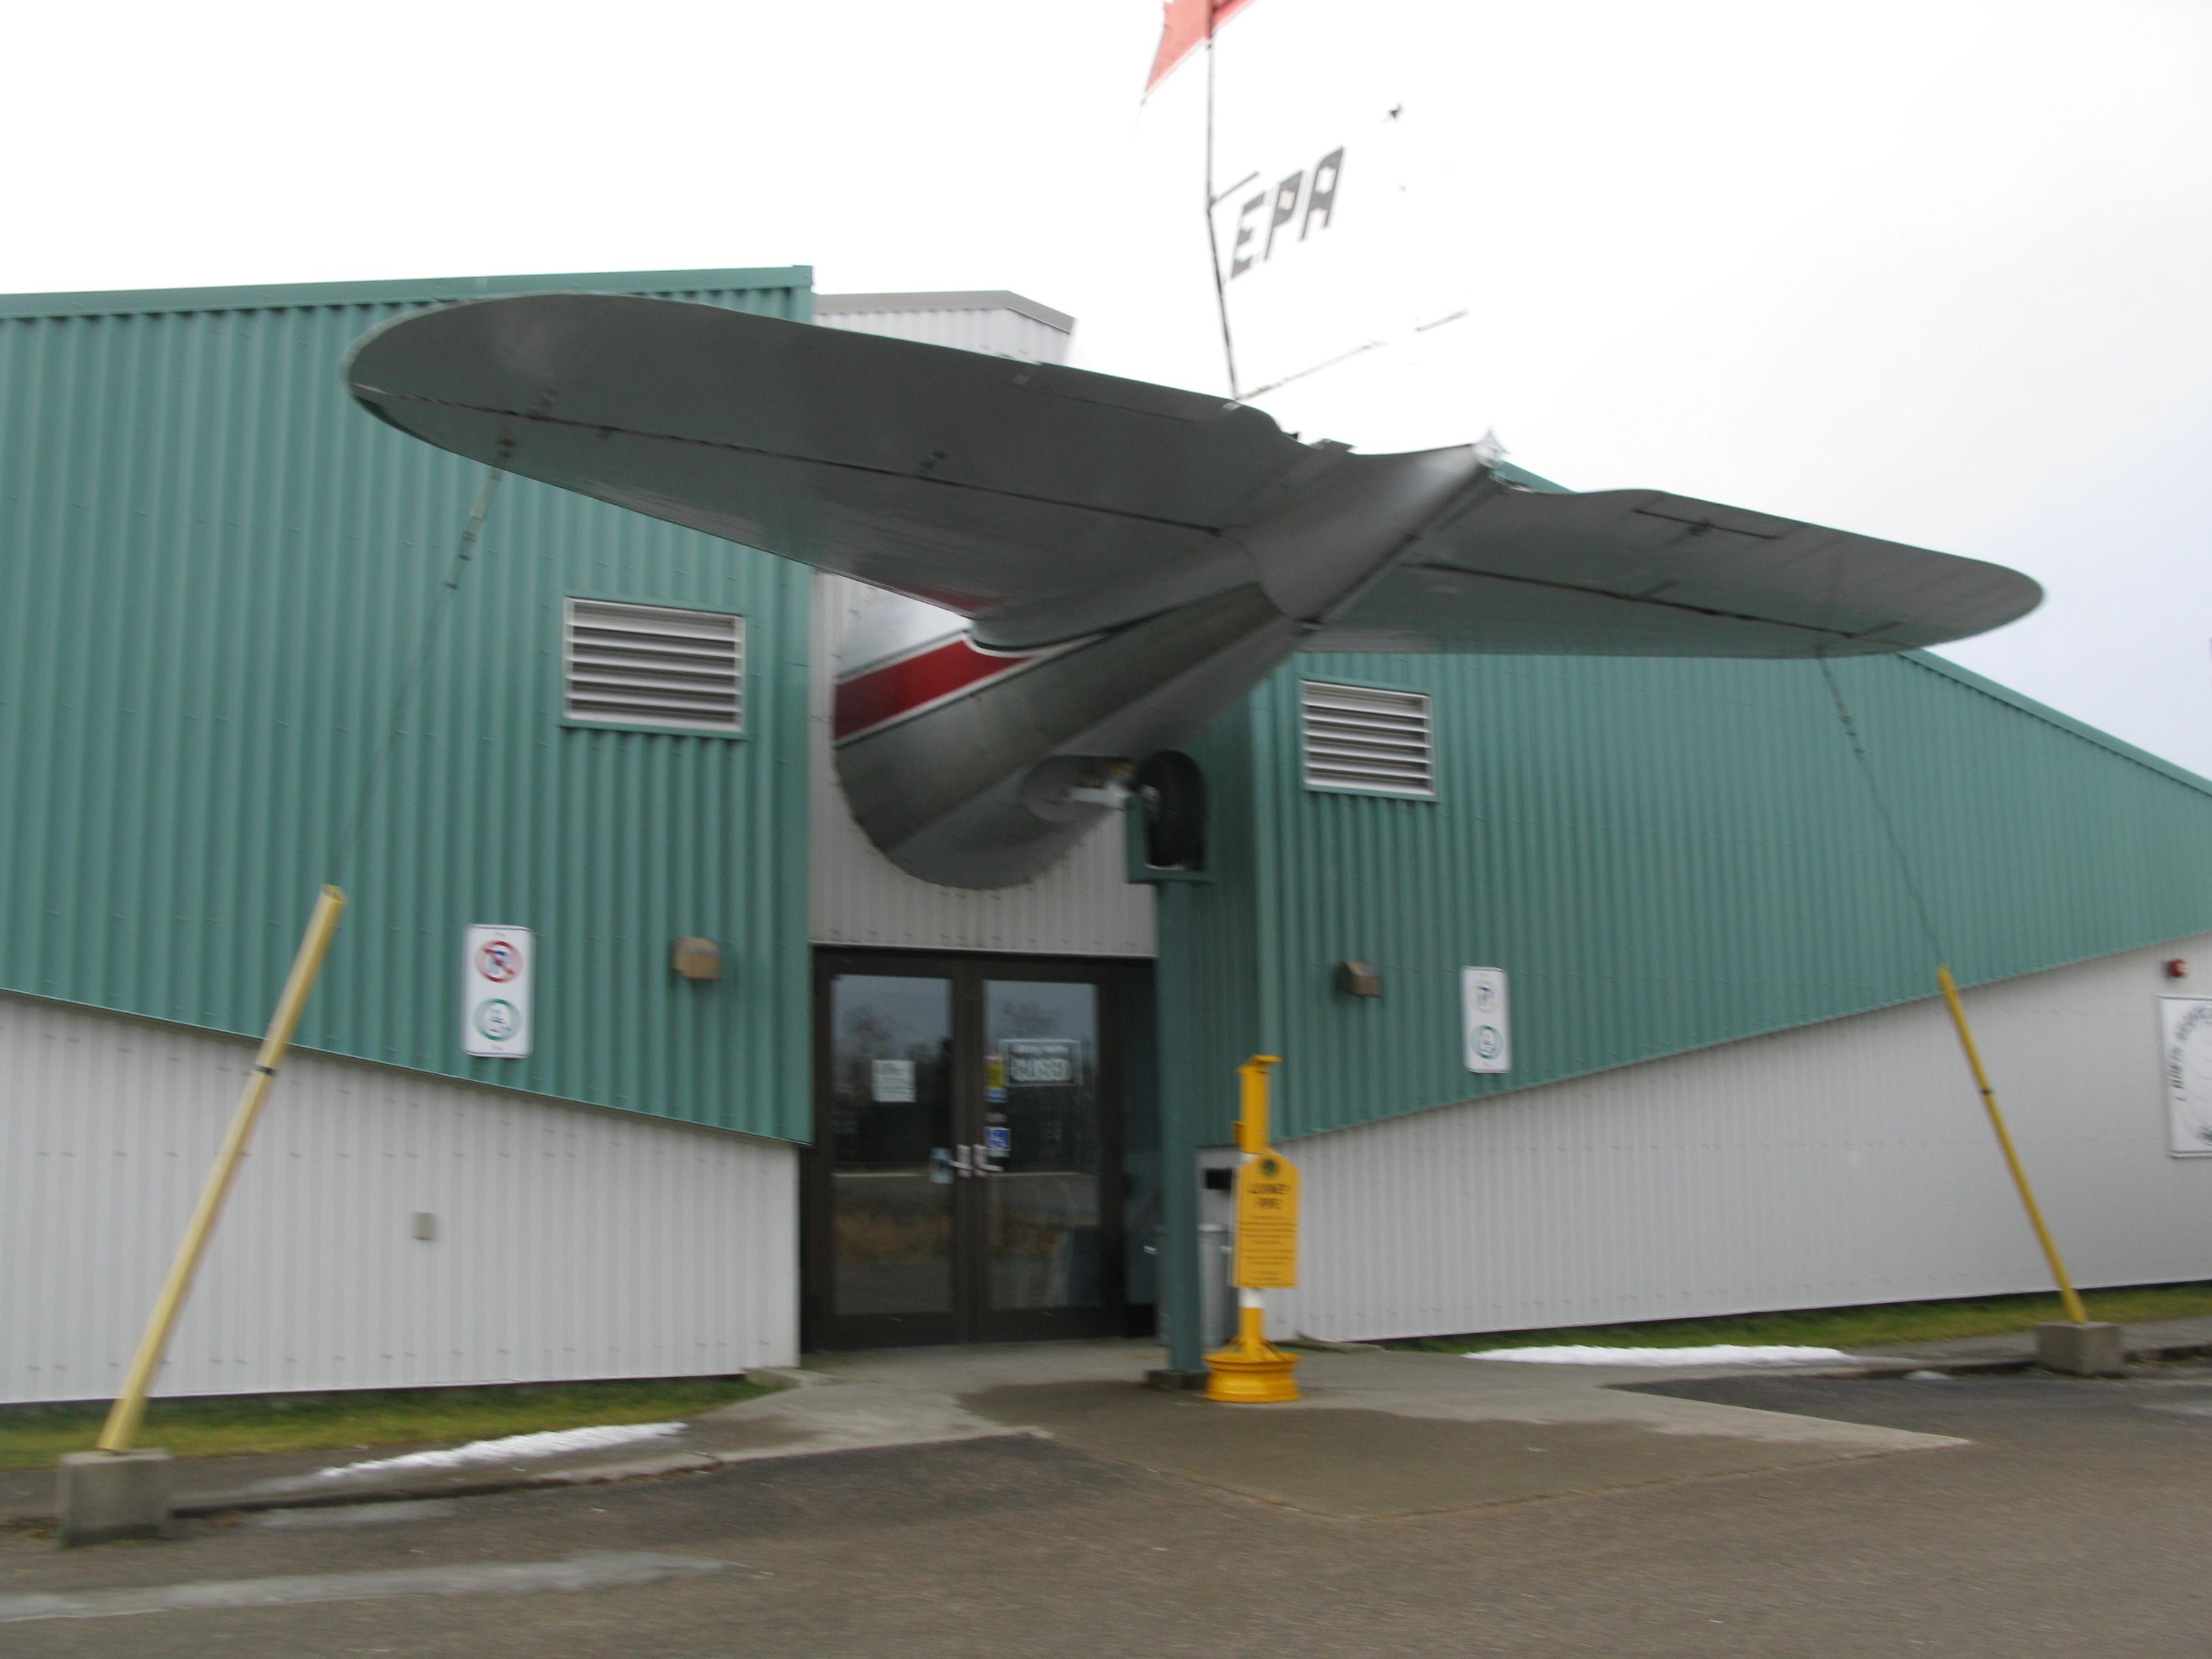 Enterprise Car Rental Gander Airport